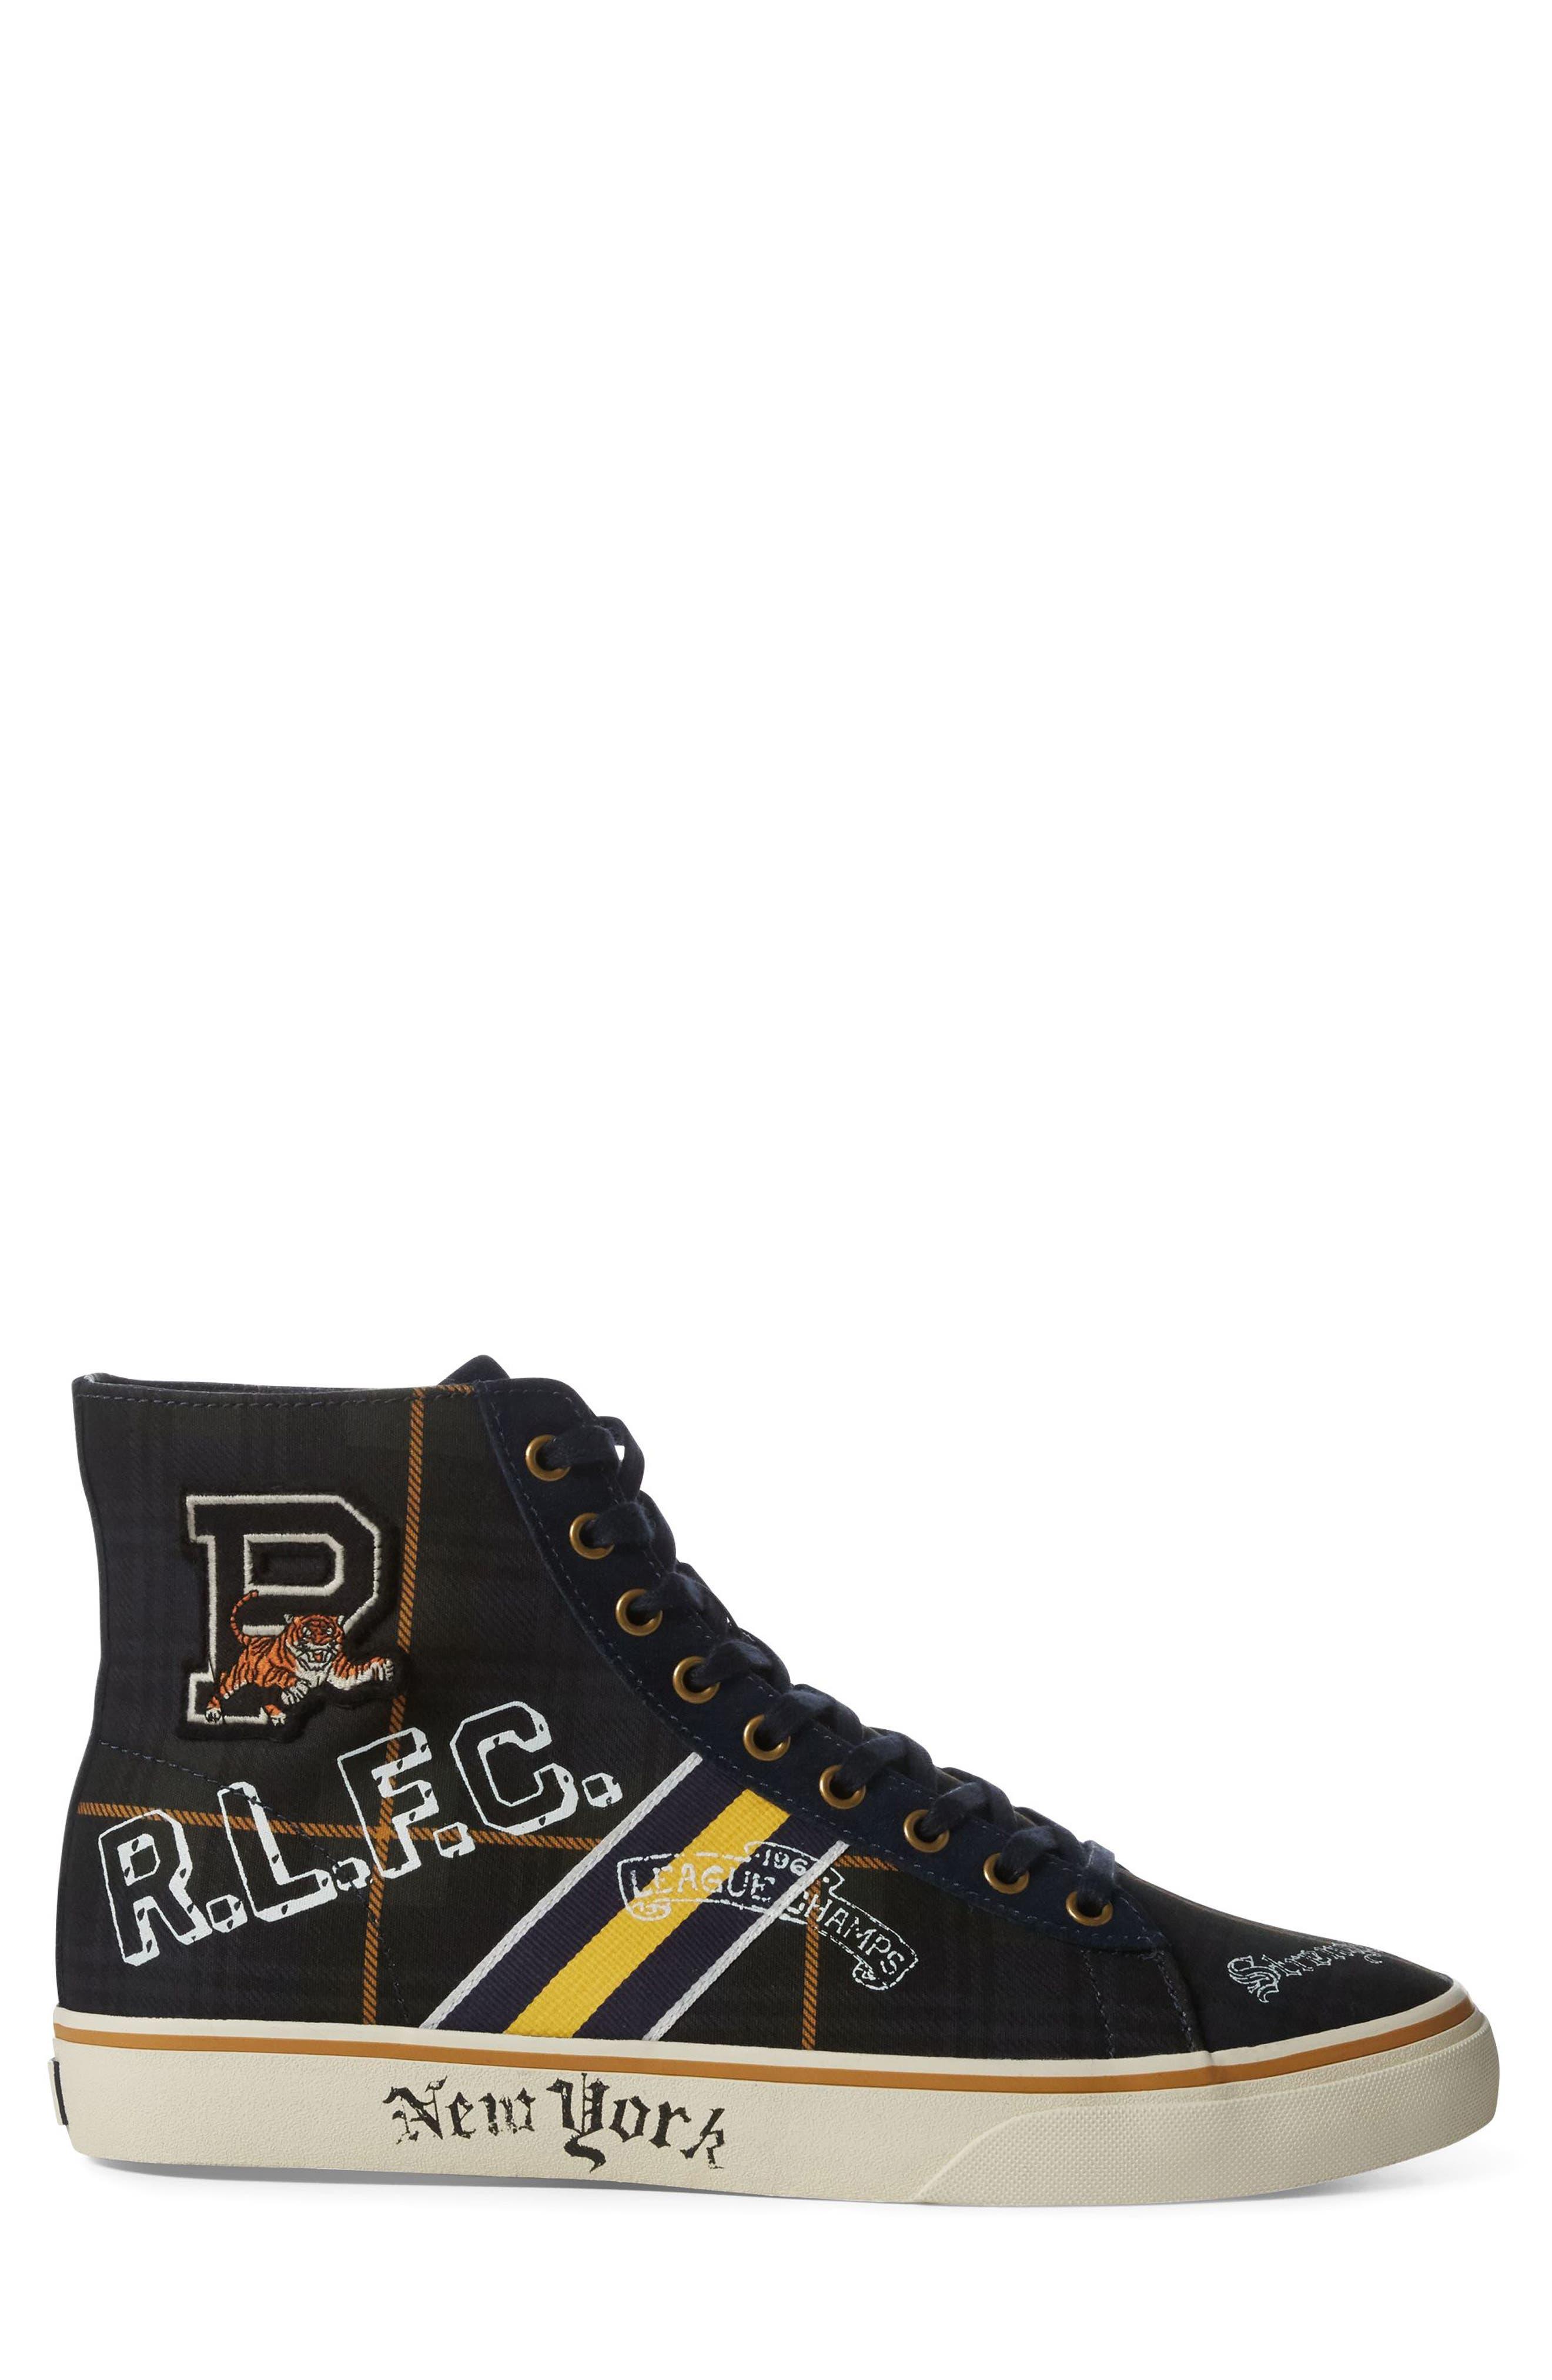 POLO RALPH LAUREN, Solomon II Sneaker, Alternate thumbnail 2, color, MULTI BLACK/ YELLOW CANVAS